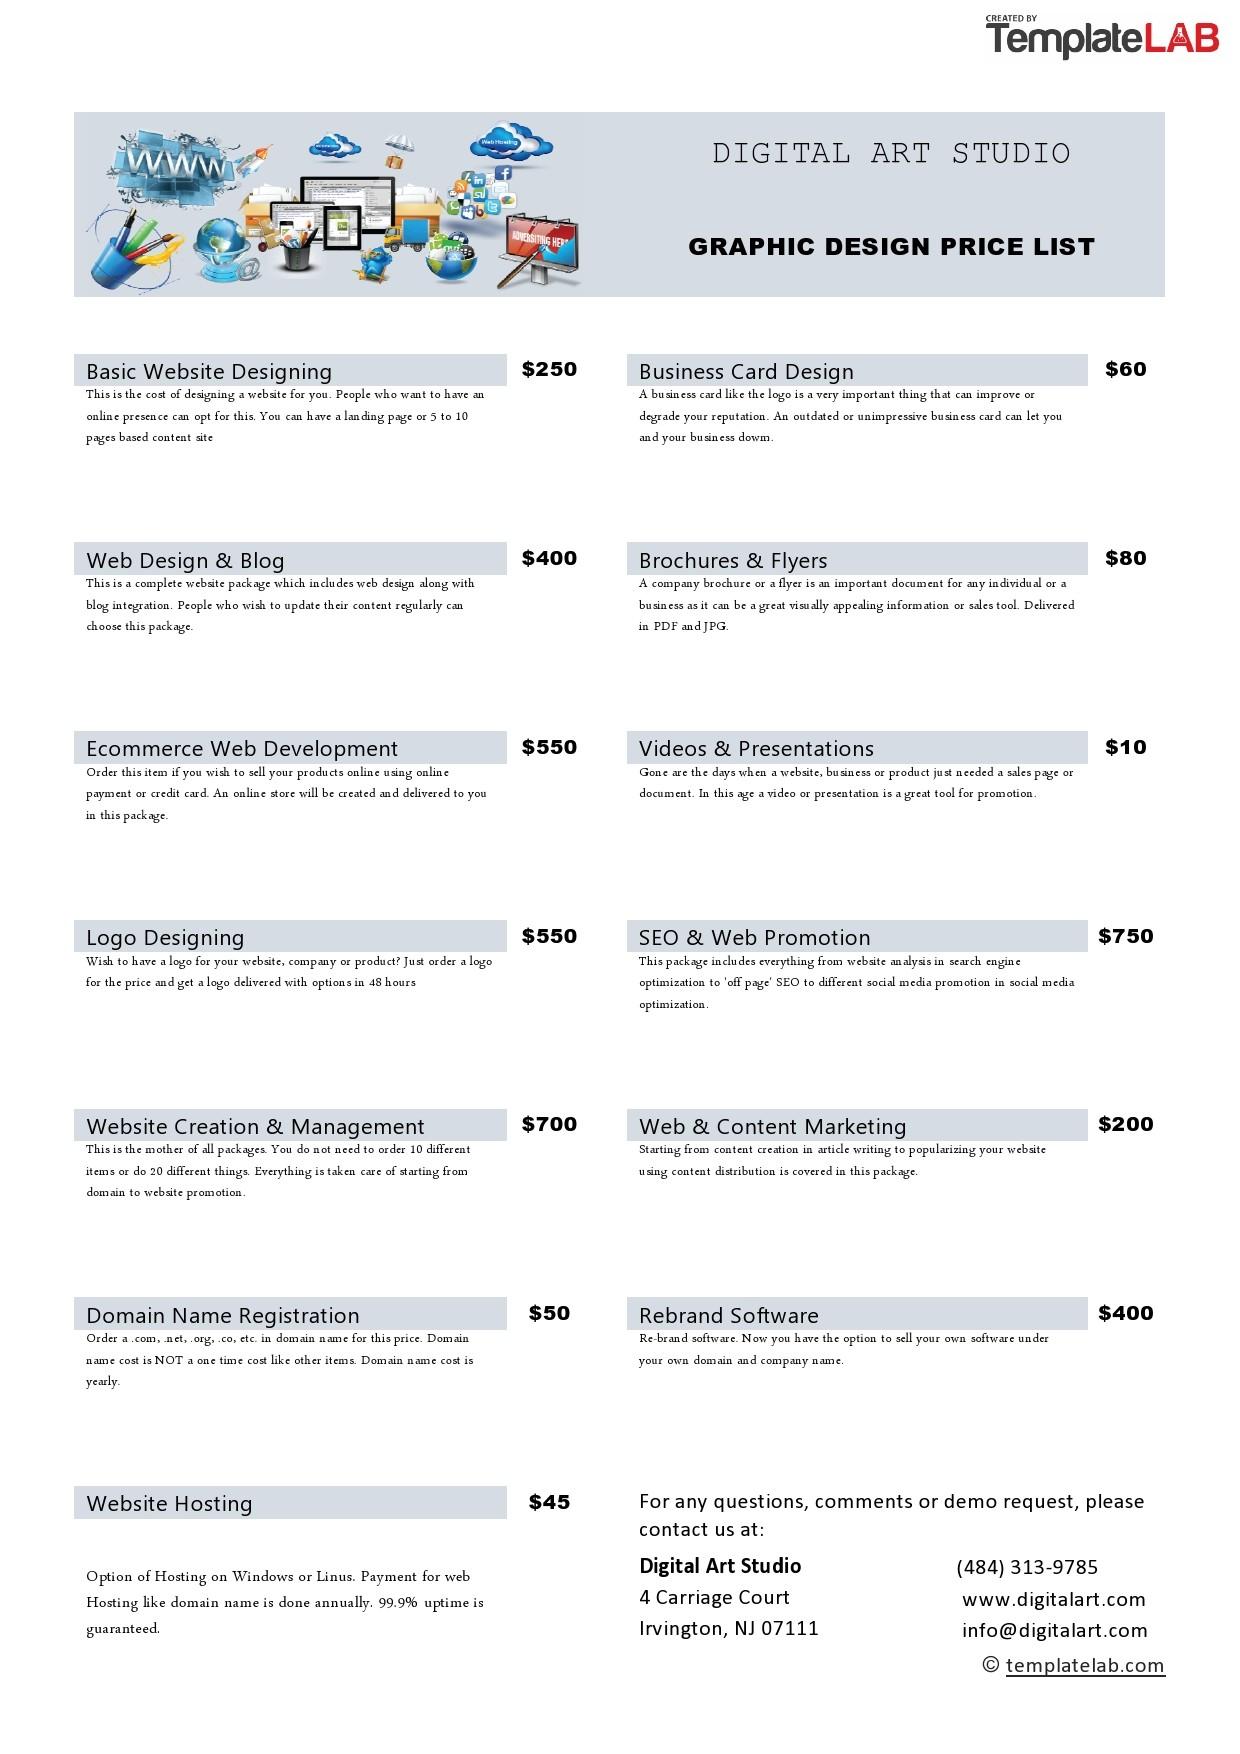 Free Graphic Design Price List Template - TemplateLab